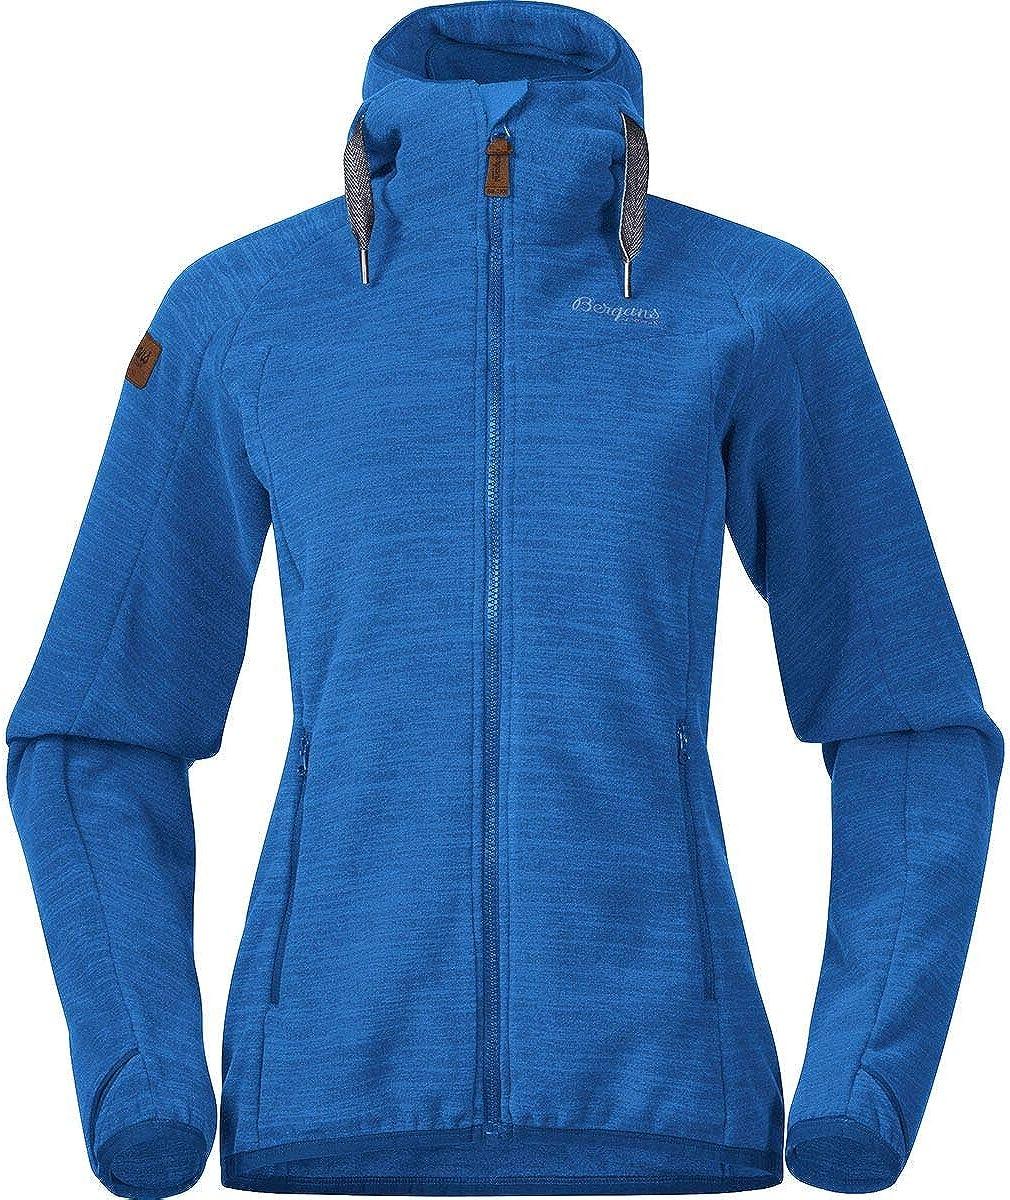 Bergans Hareid Fleece Jacket Women   Damen Fleecejacke